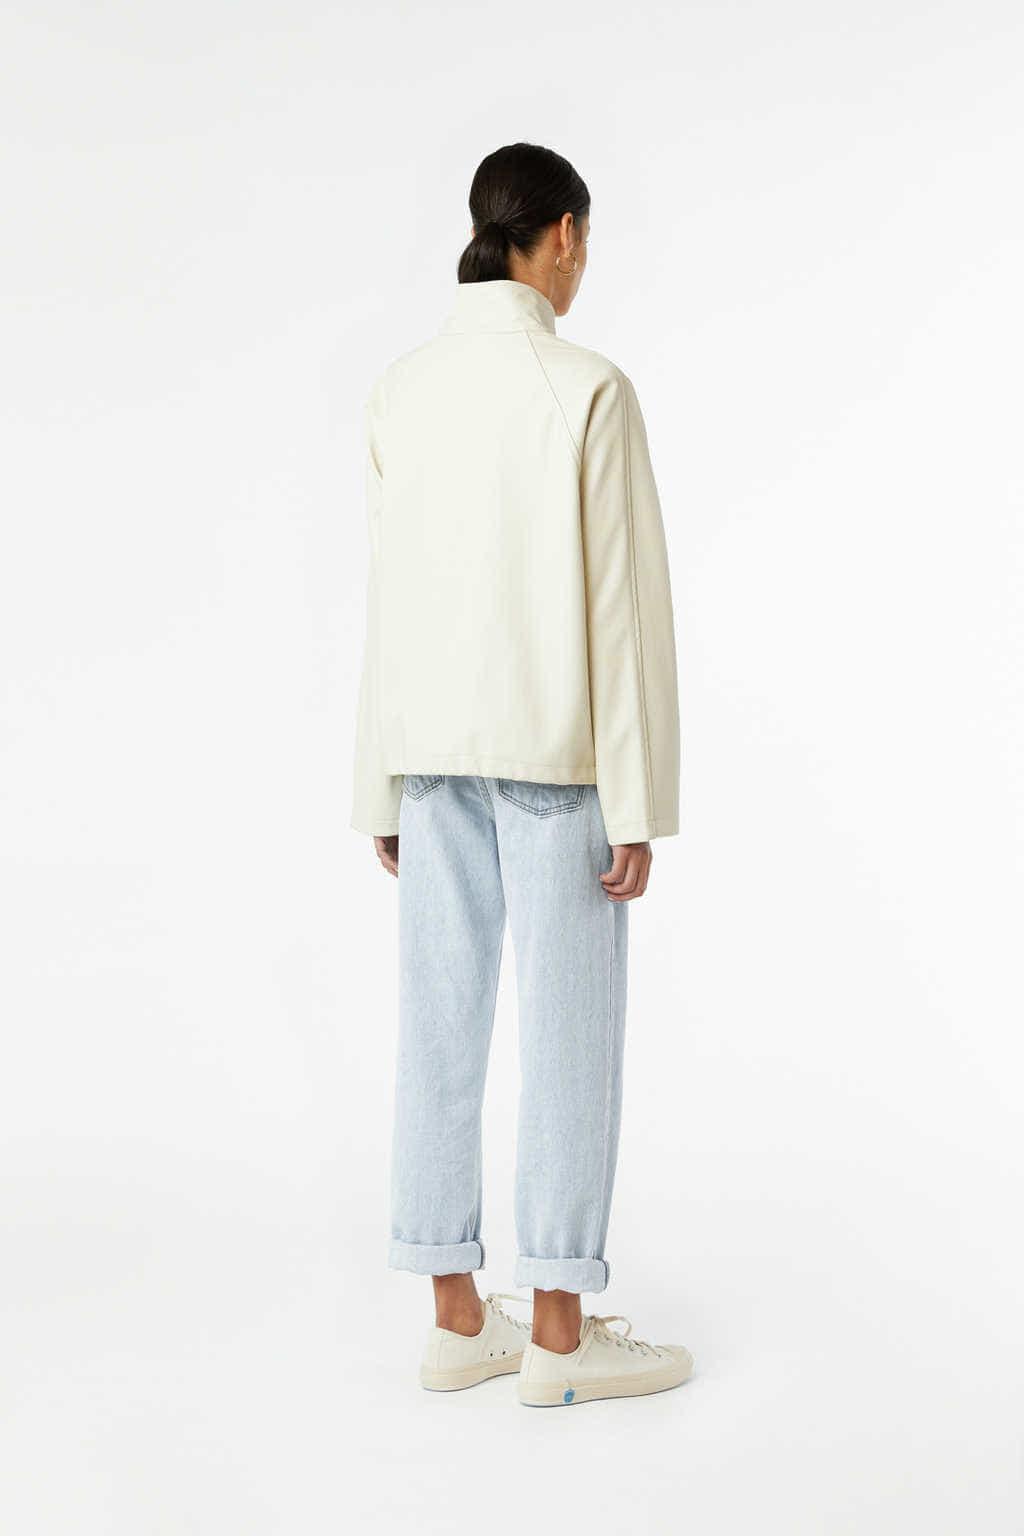 Jacket K001 Cream 4